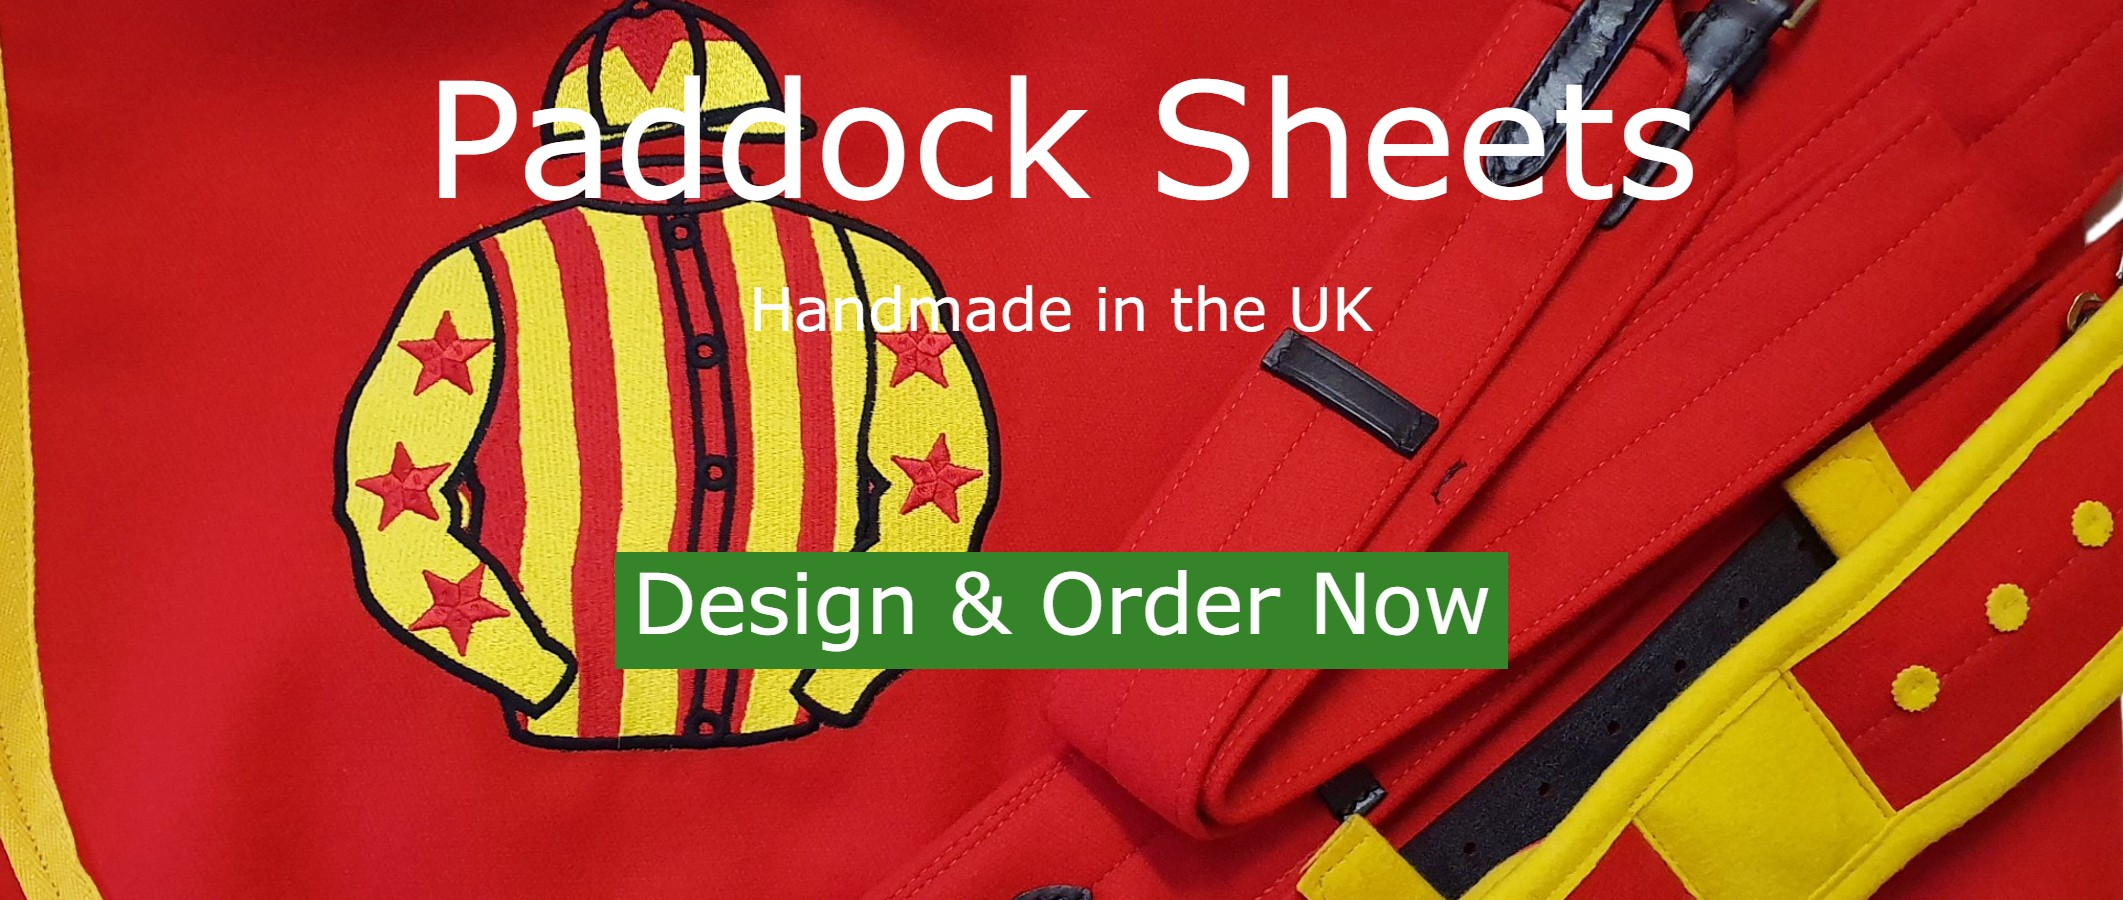 Design Melton Paddock Sheets